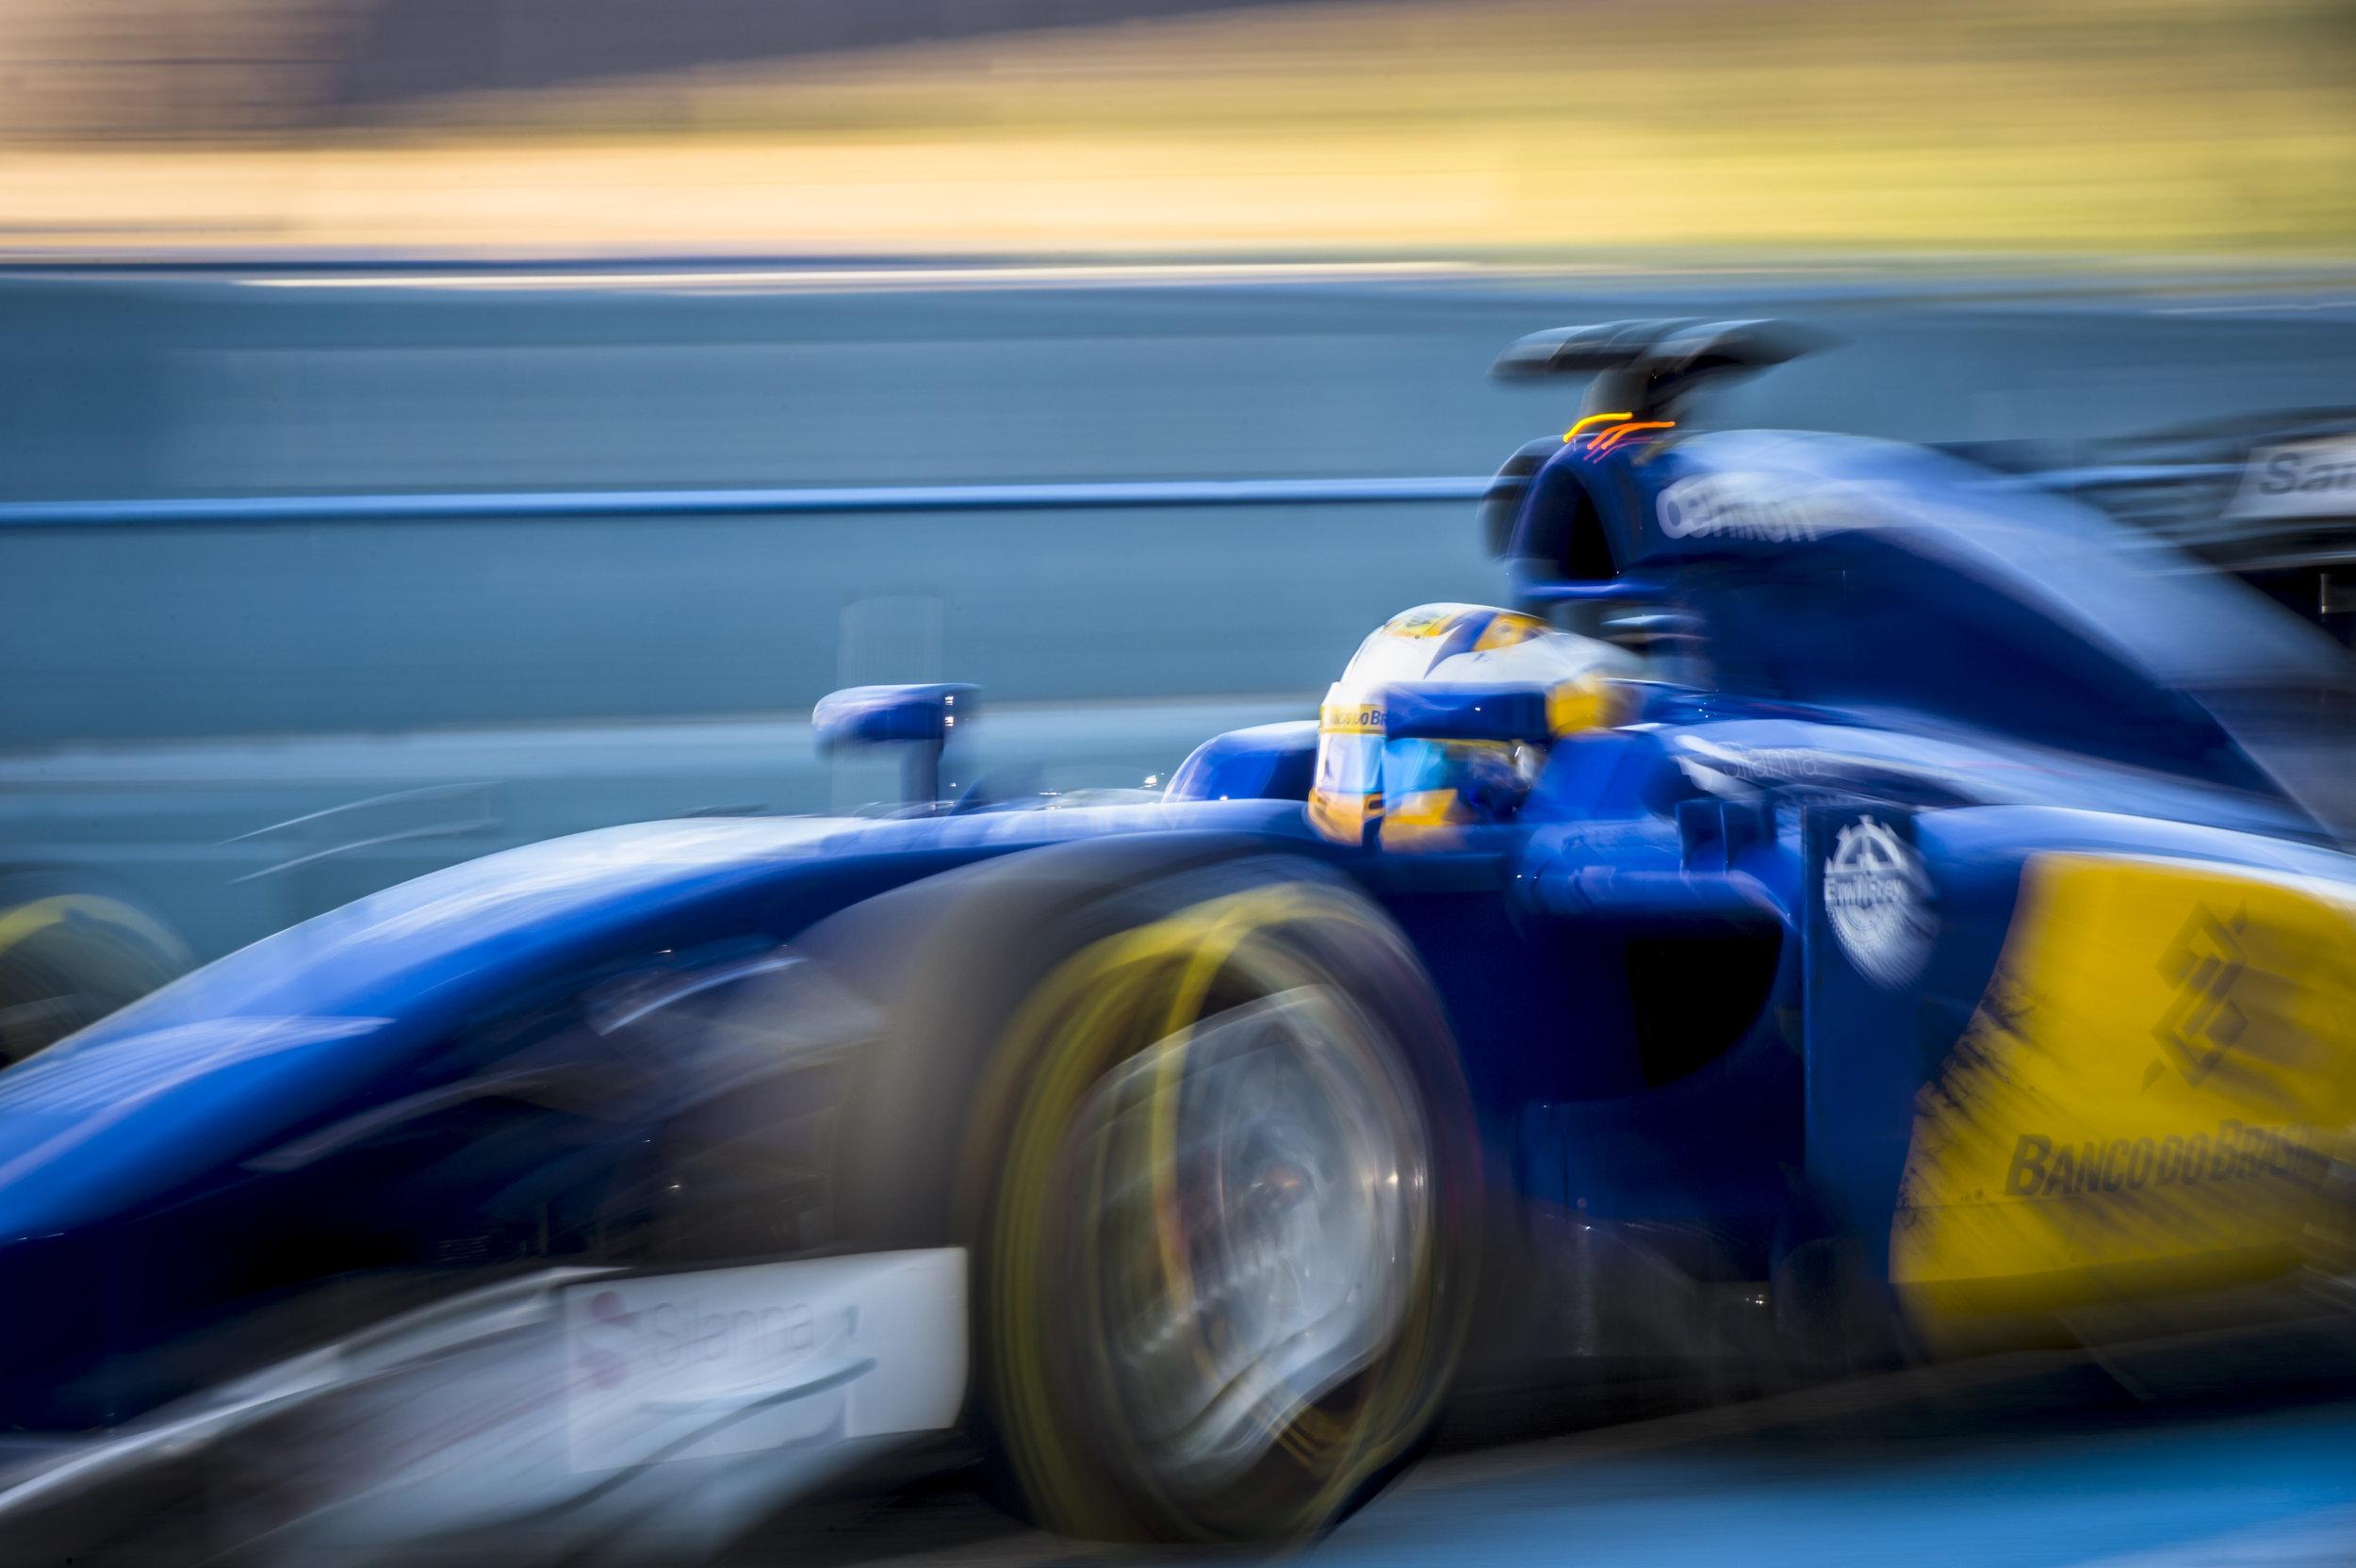 Marcu Ericsson Jerez 2015 (14 of 3).jpg